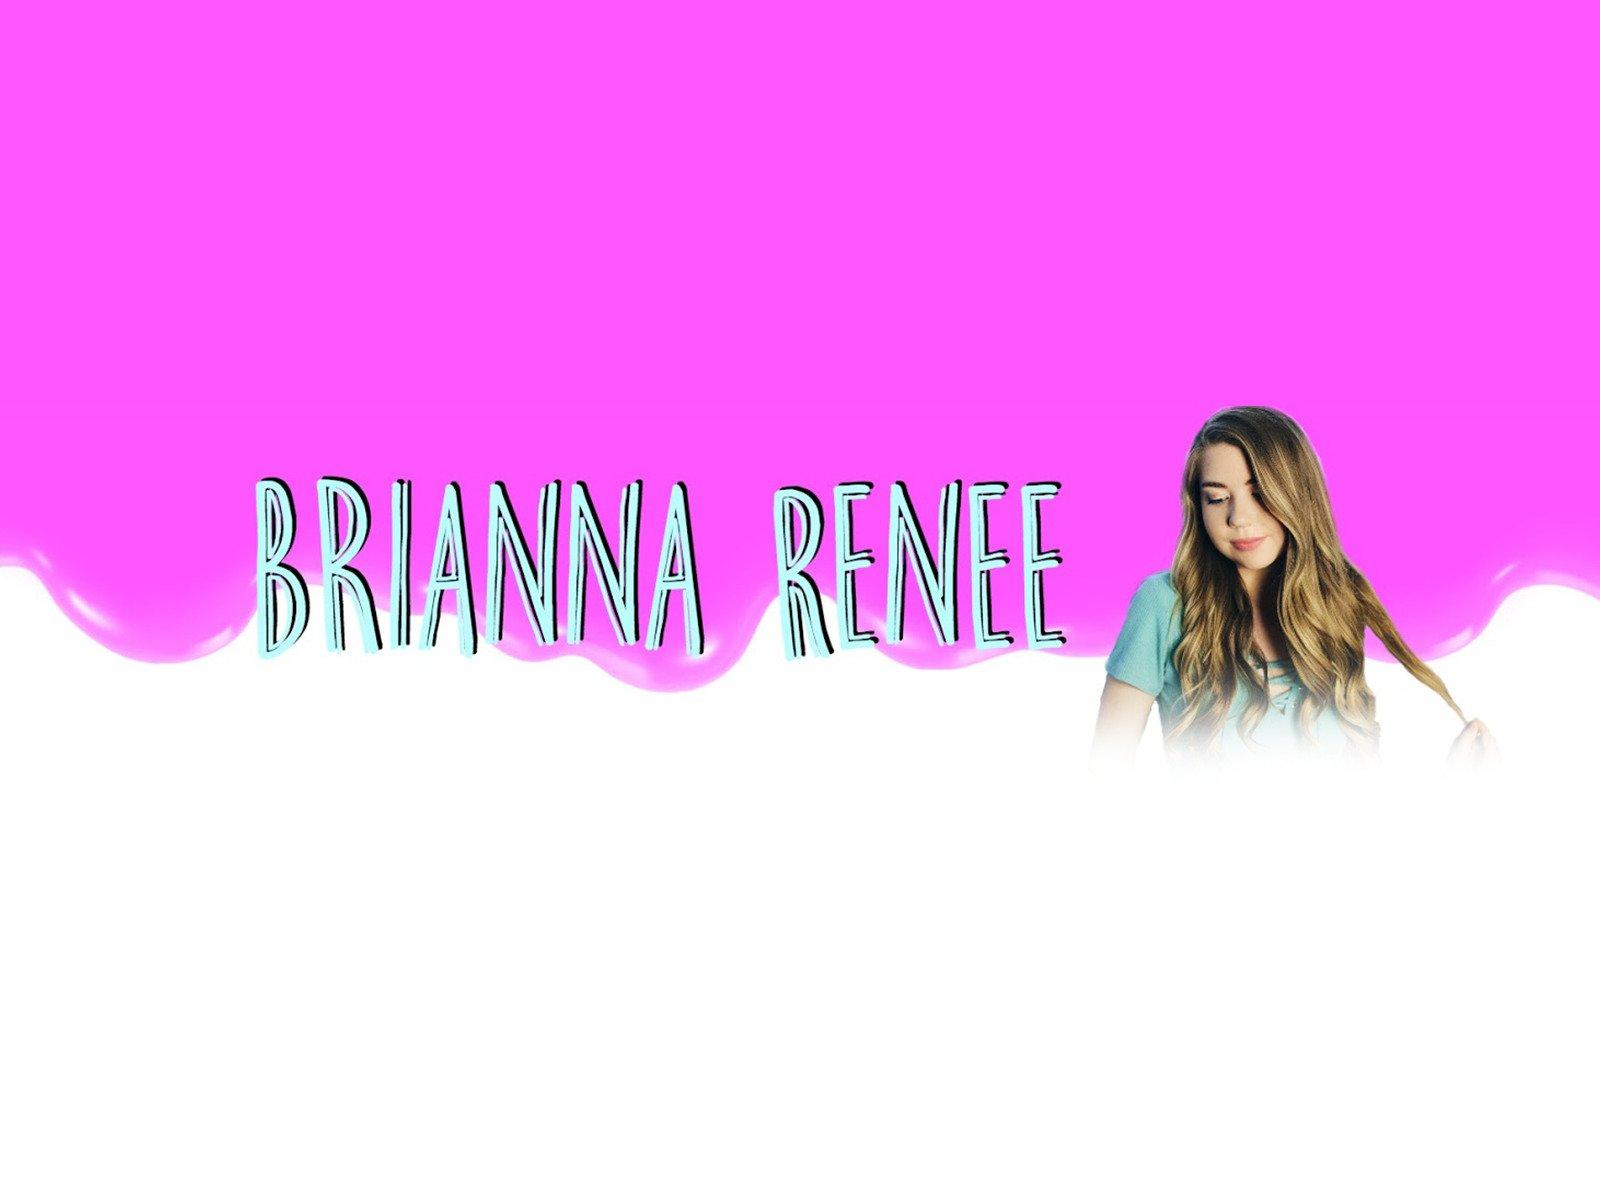 Brianna Renee - Season 2